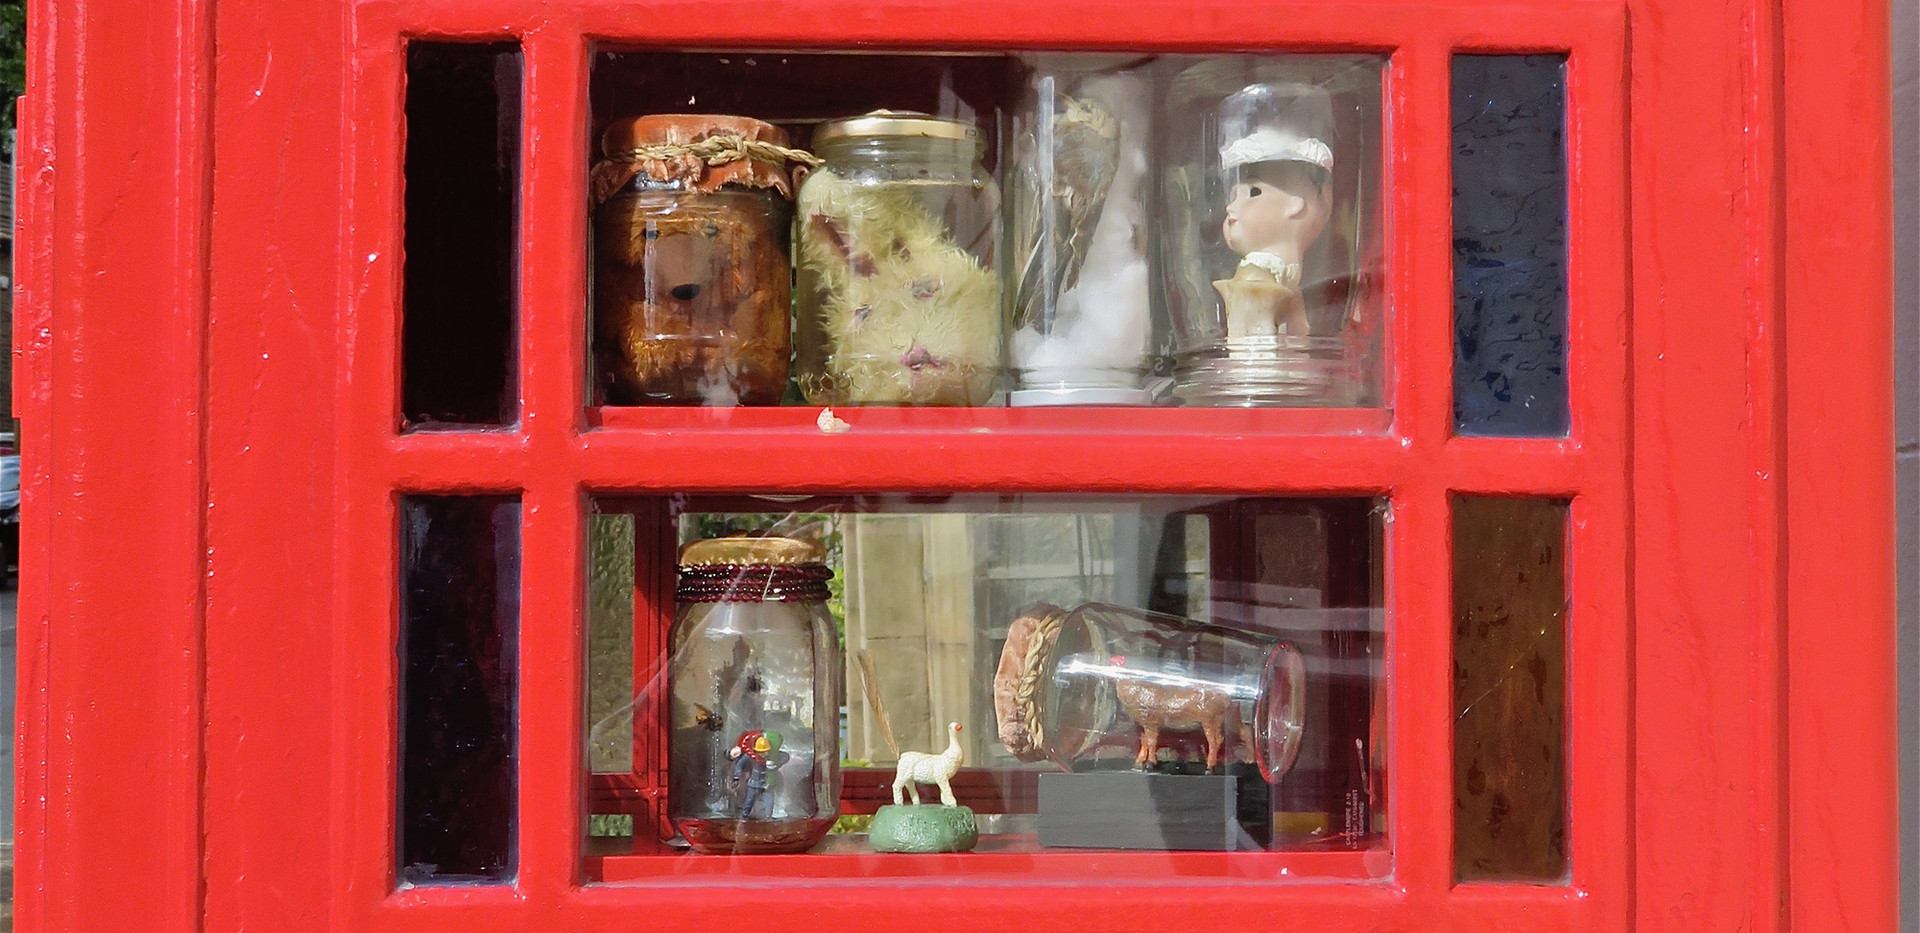 Warley Museum